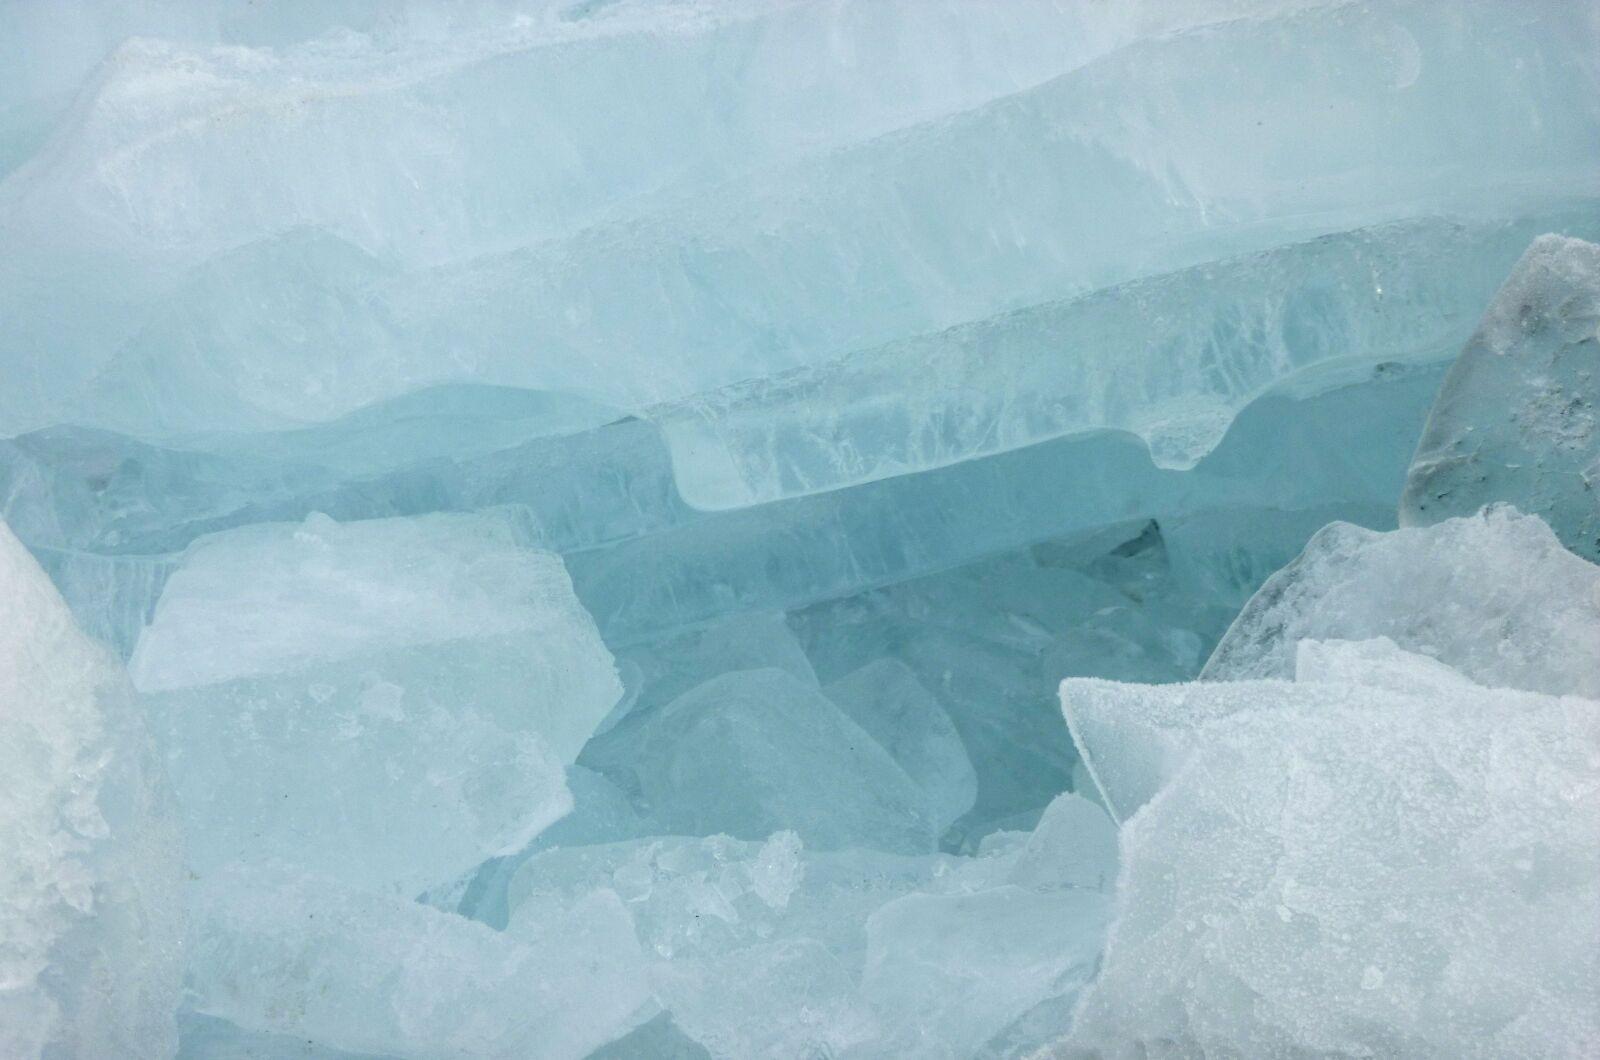 ice, winter, nearby